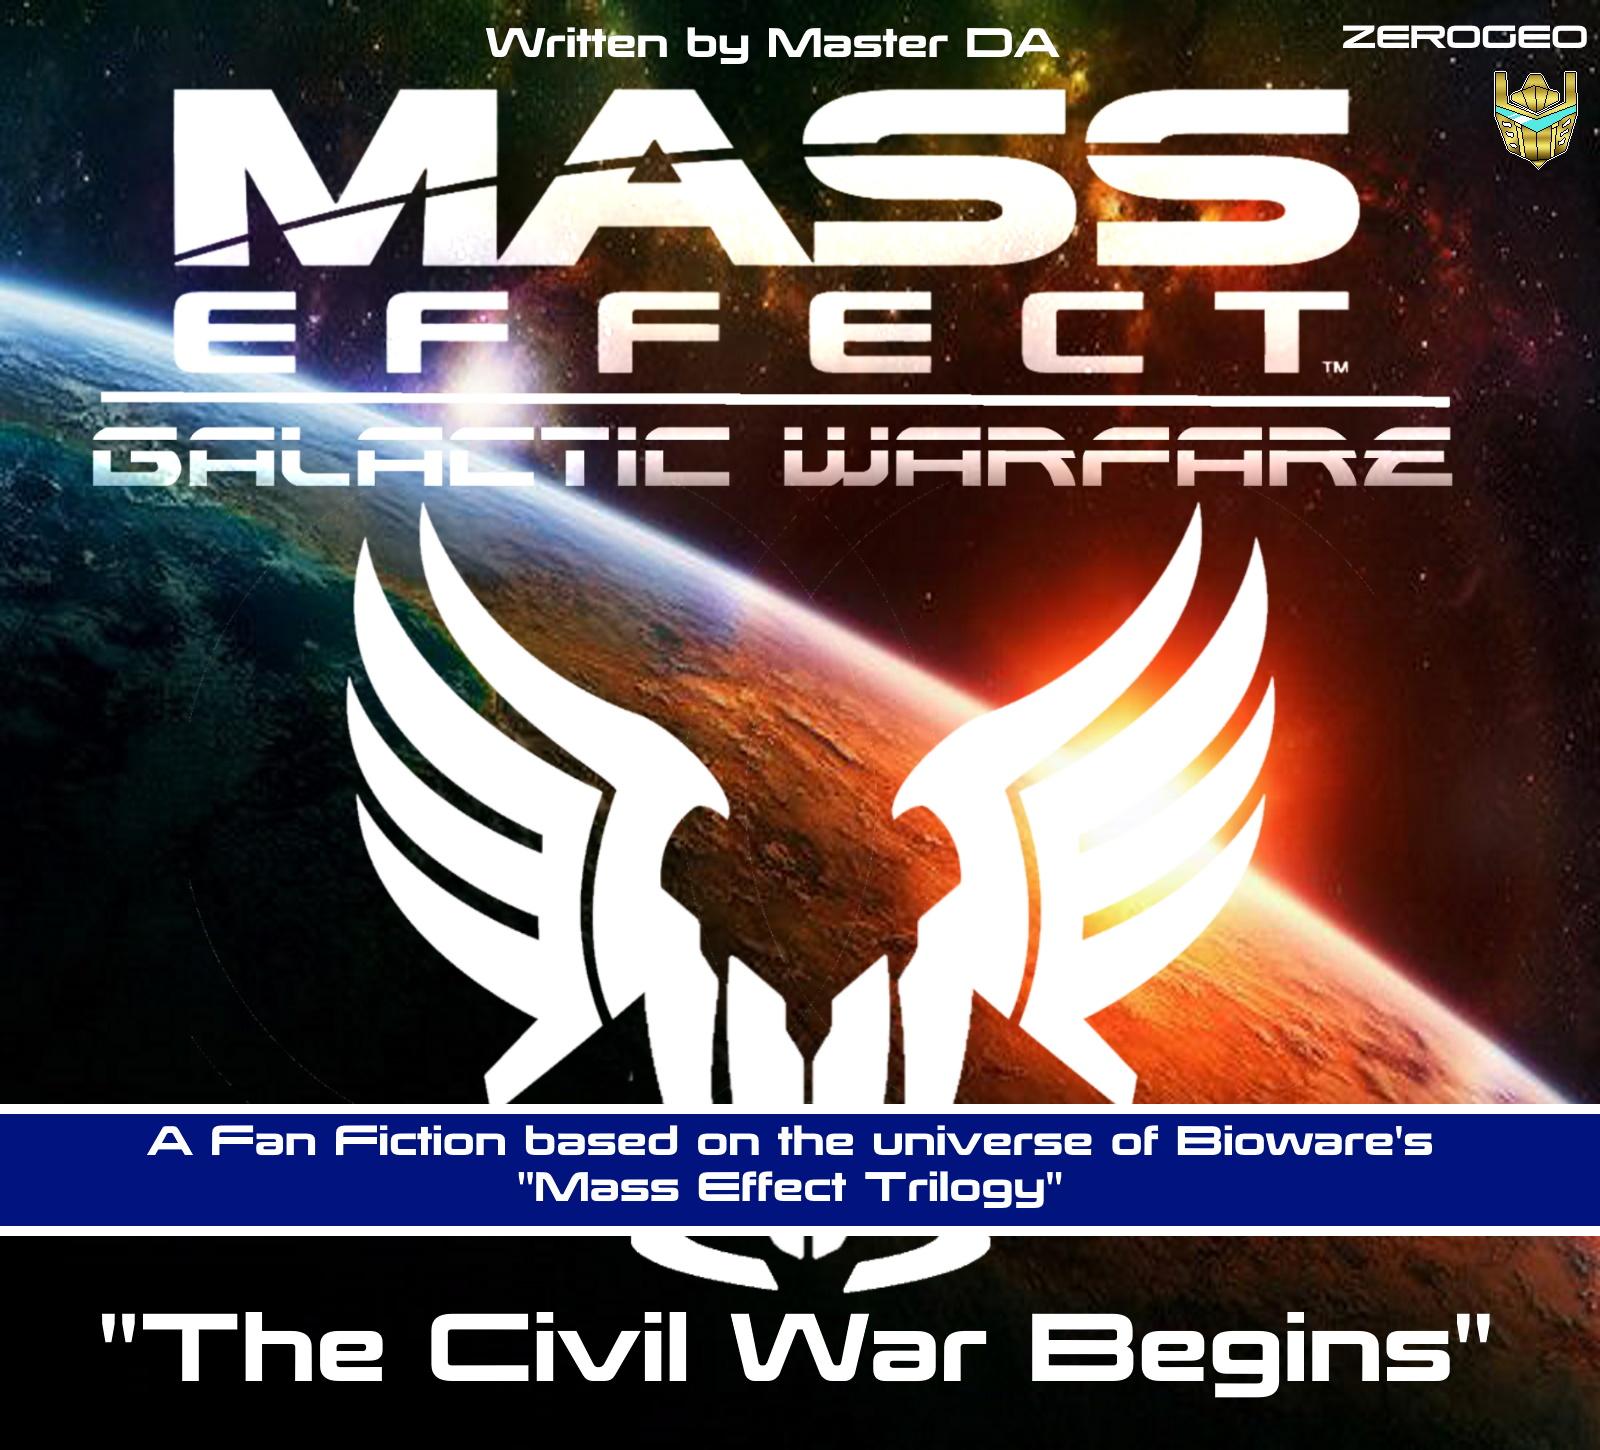 Mass Effect 4: Galactic Warfare | Mass Effect Fan Fiction